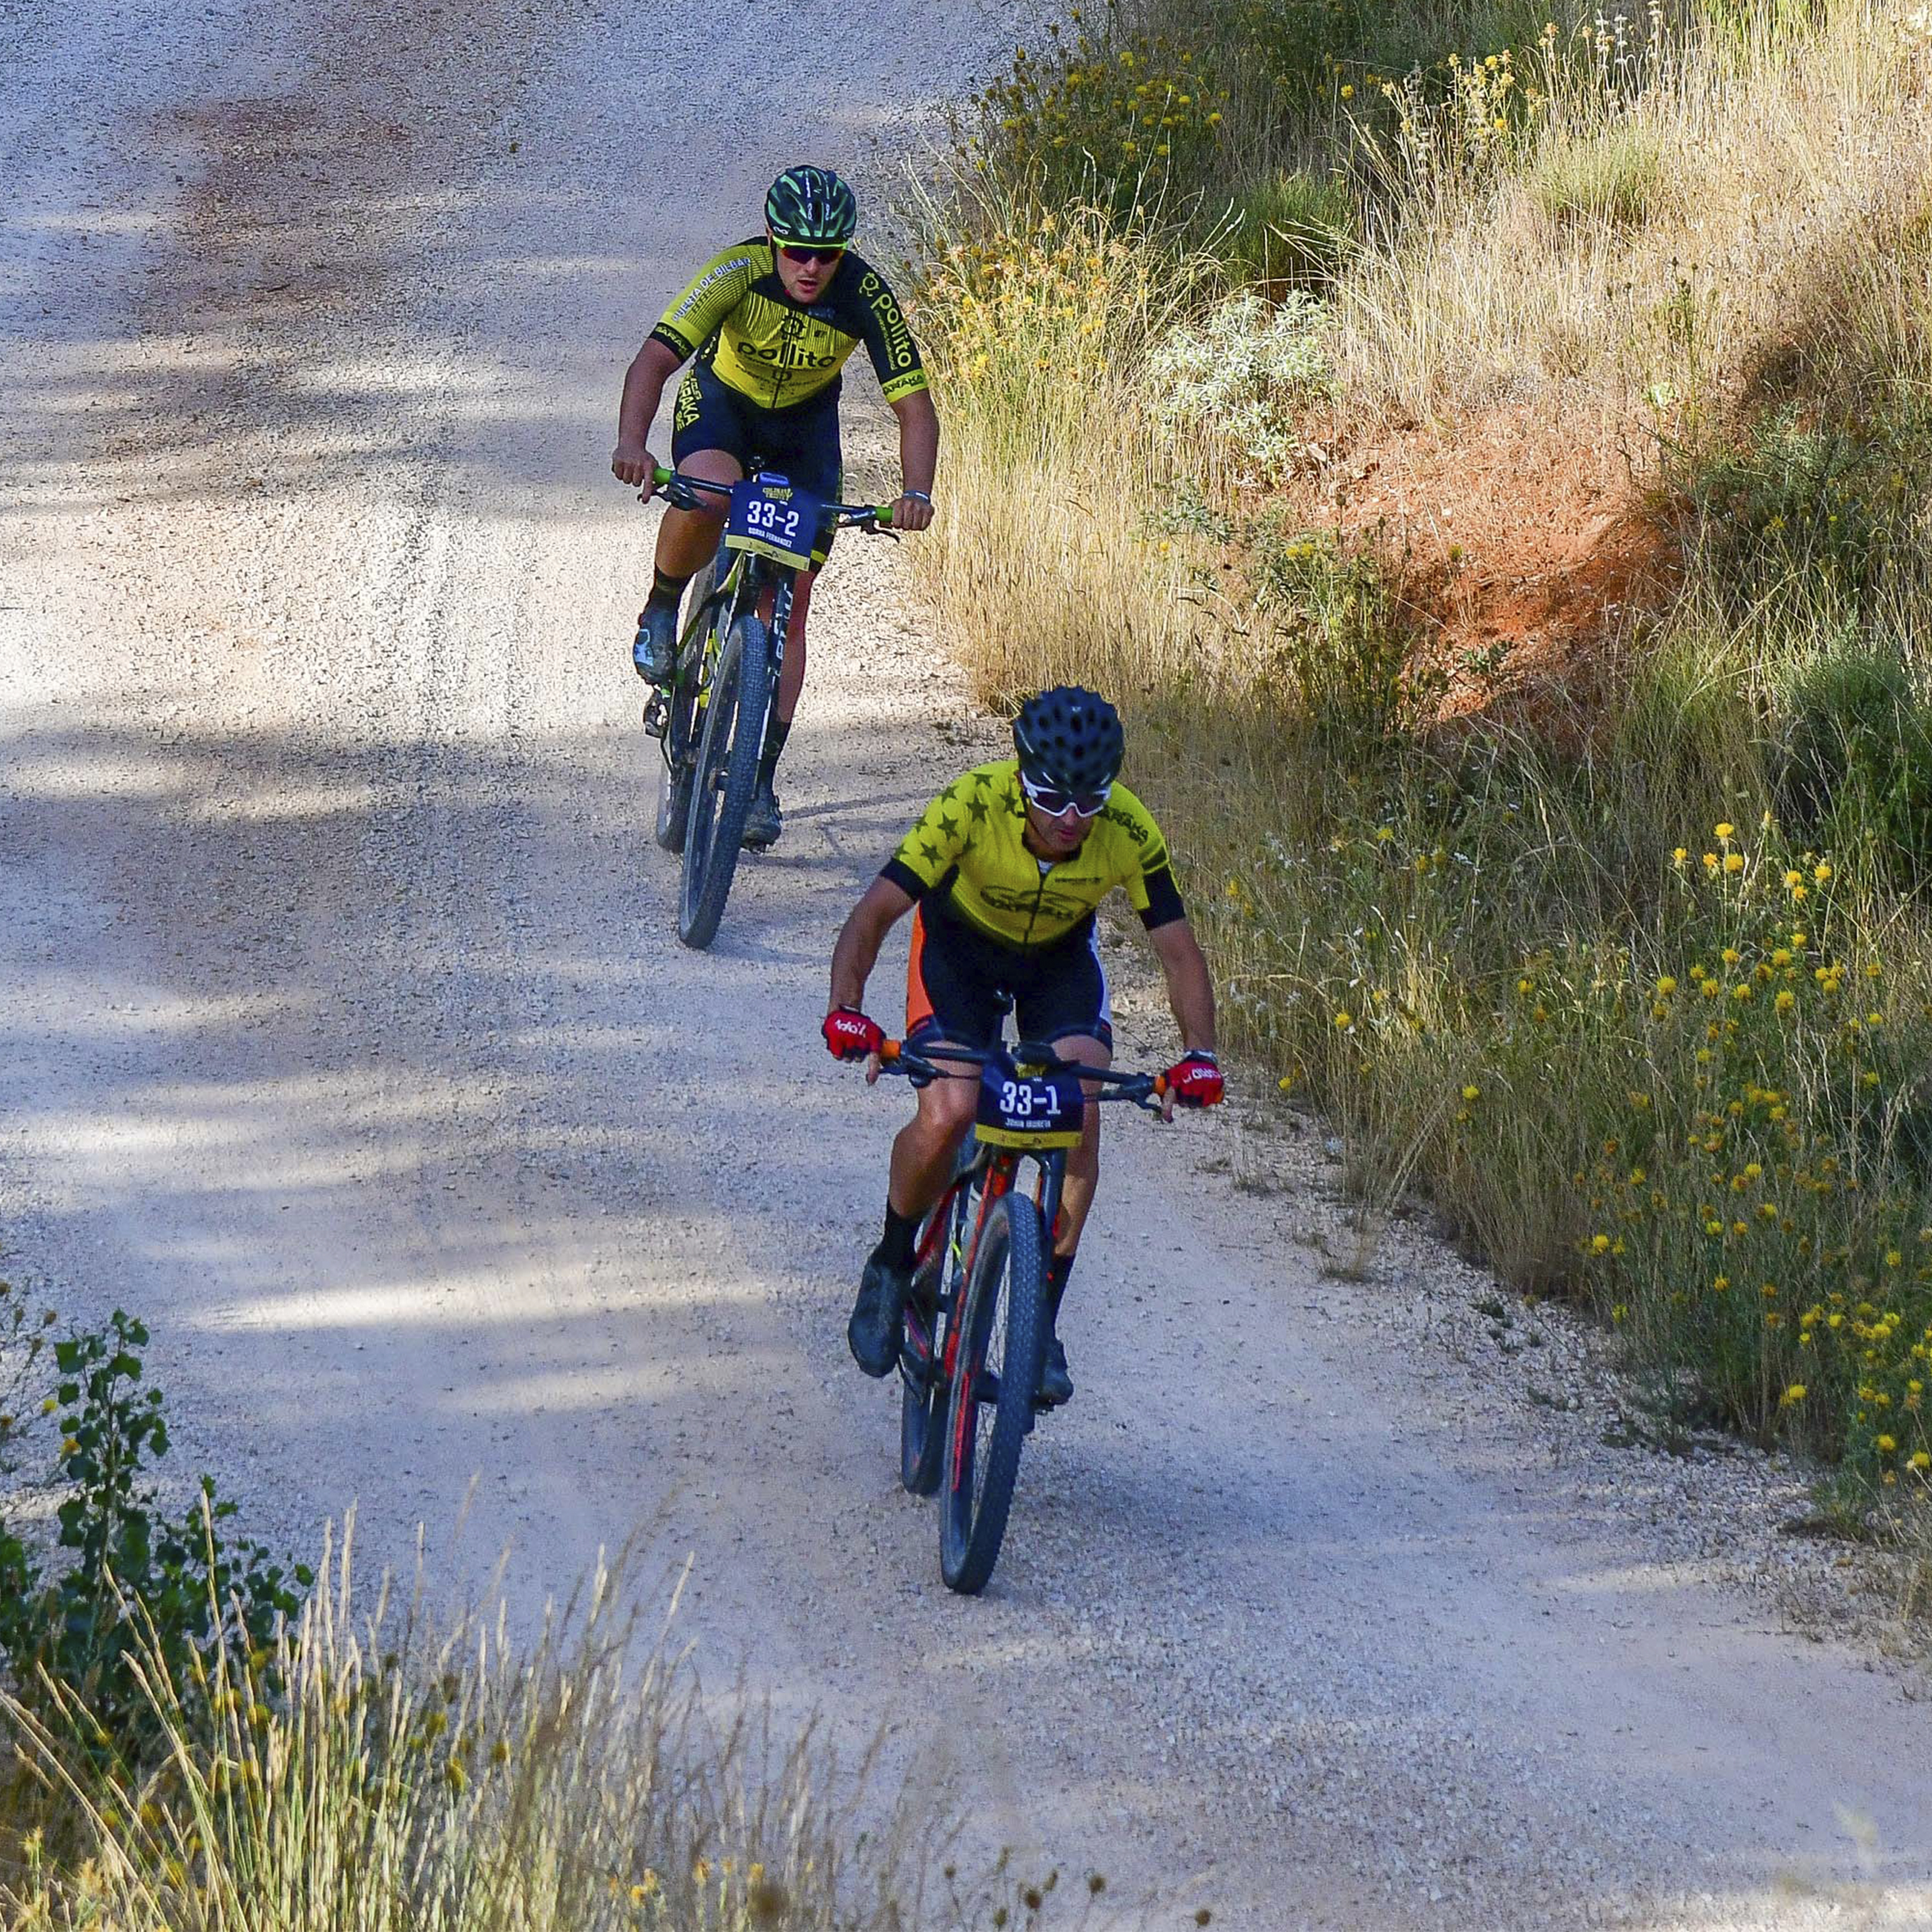 Tercera fase de inscripciones para Colina Triste UCI S1 completadas